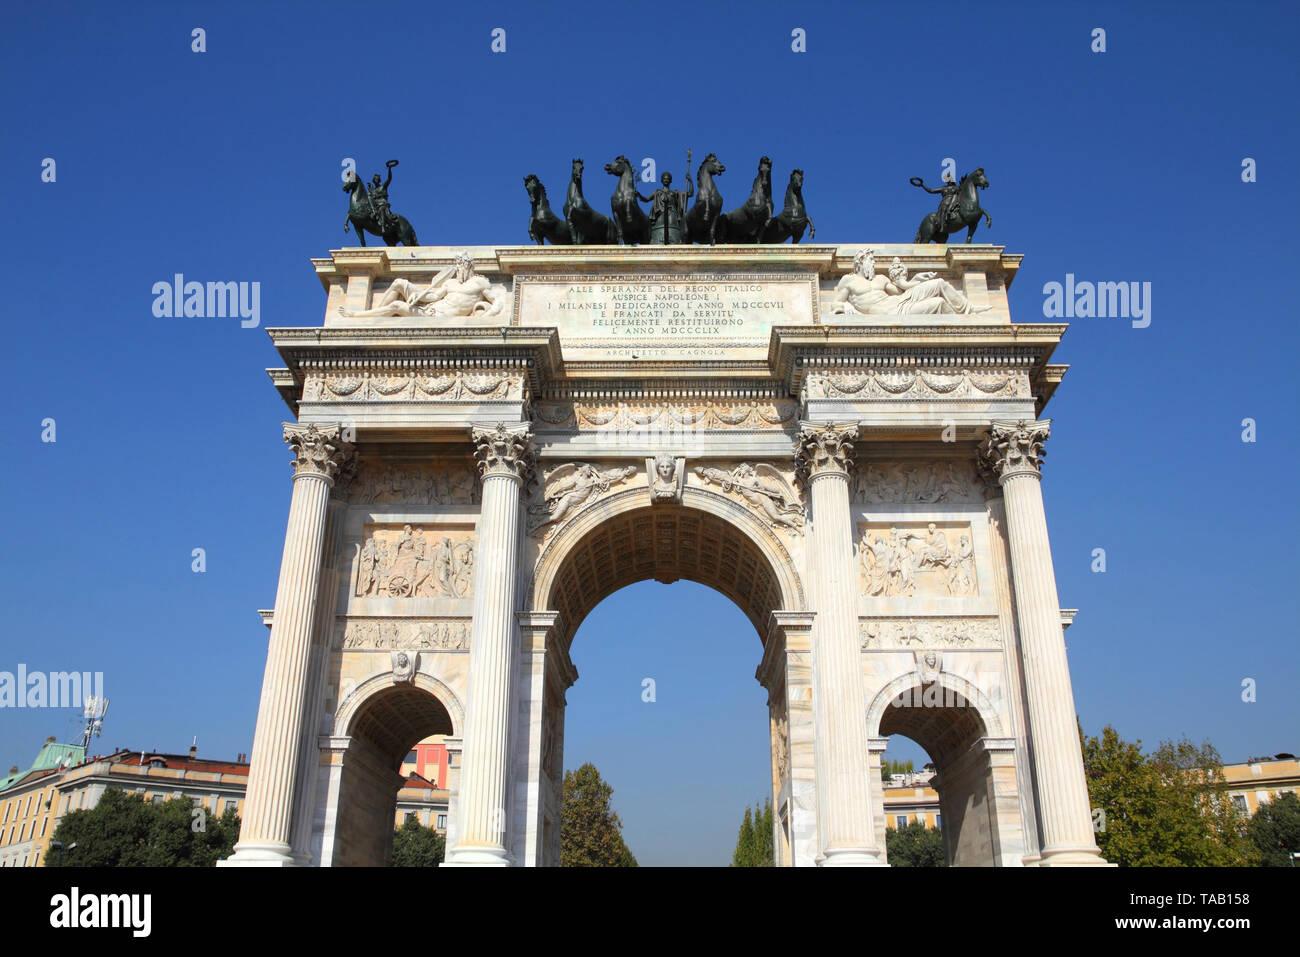 Milan, Italy. Arco della Pace (Arch of Peace) in Sempione Park. - Stock Image